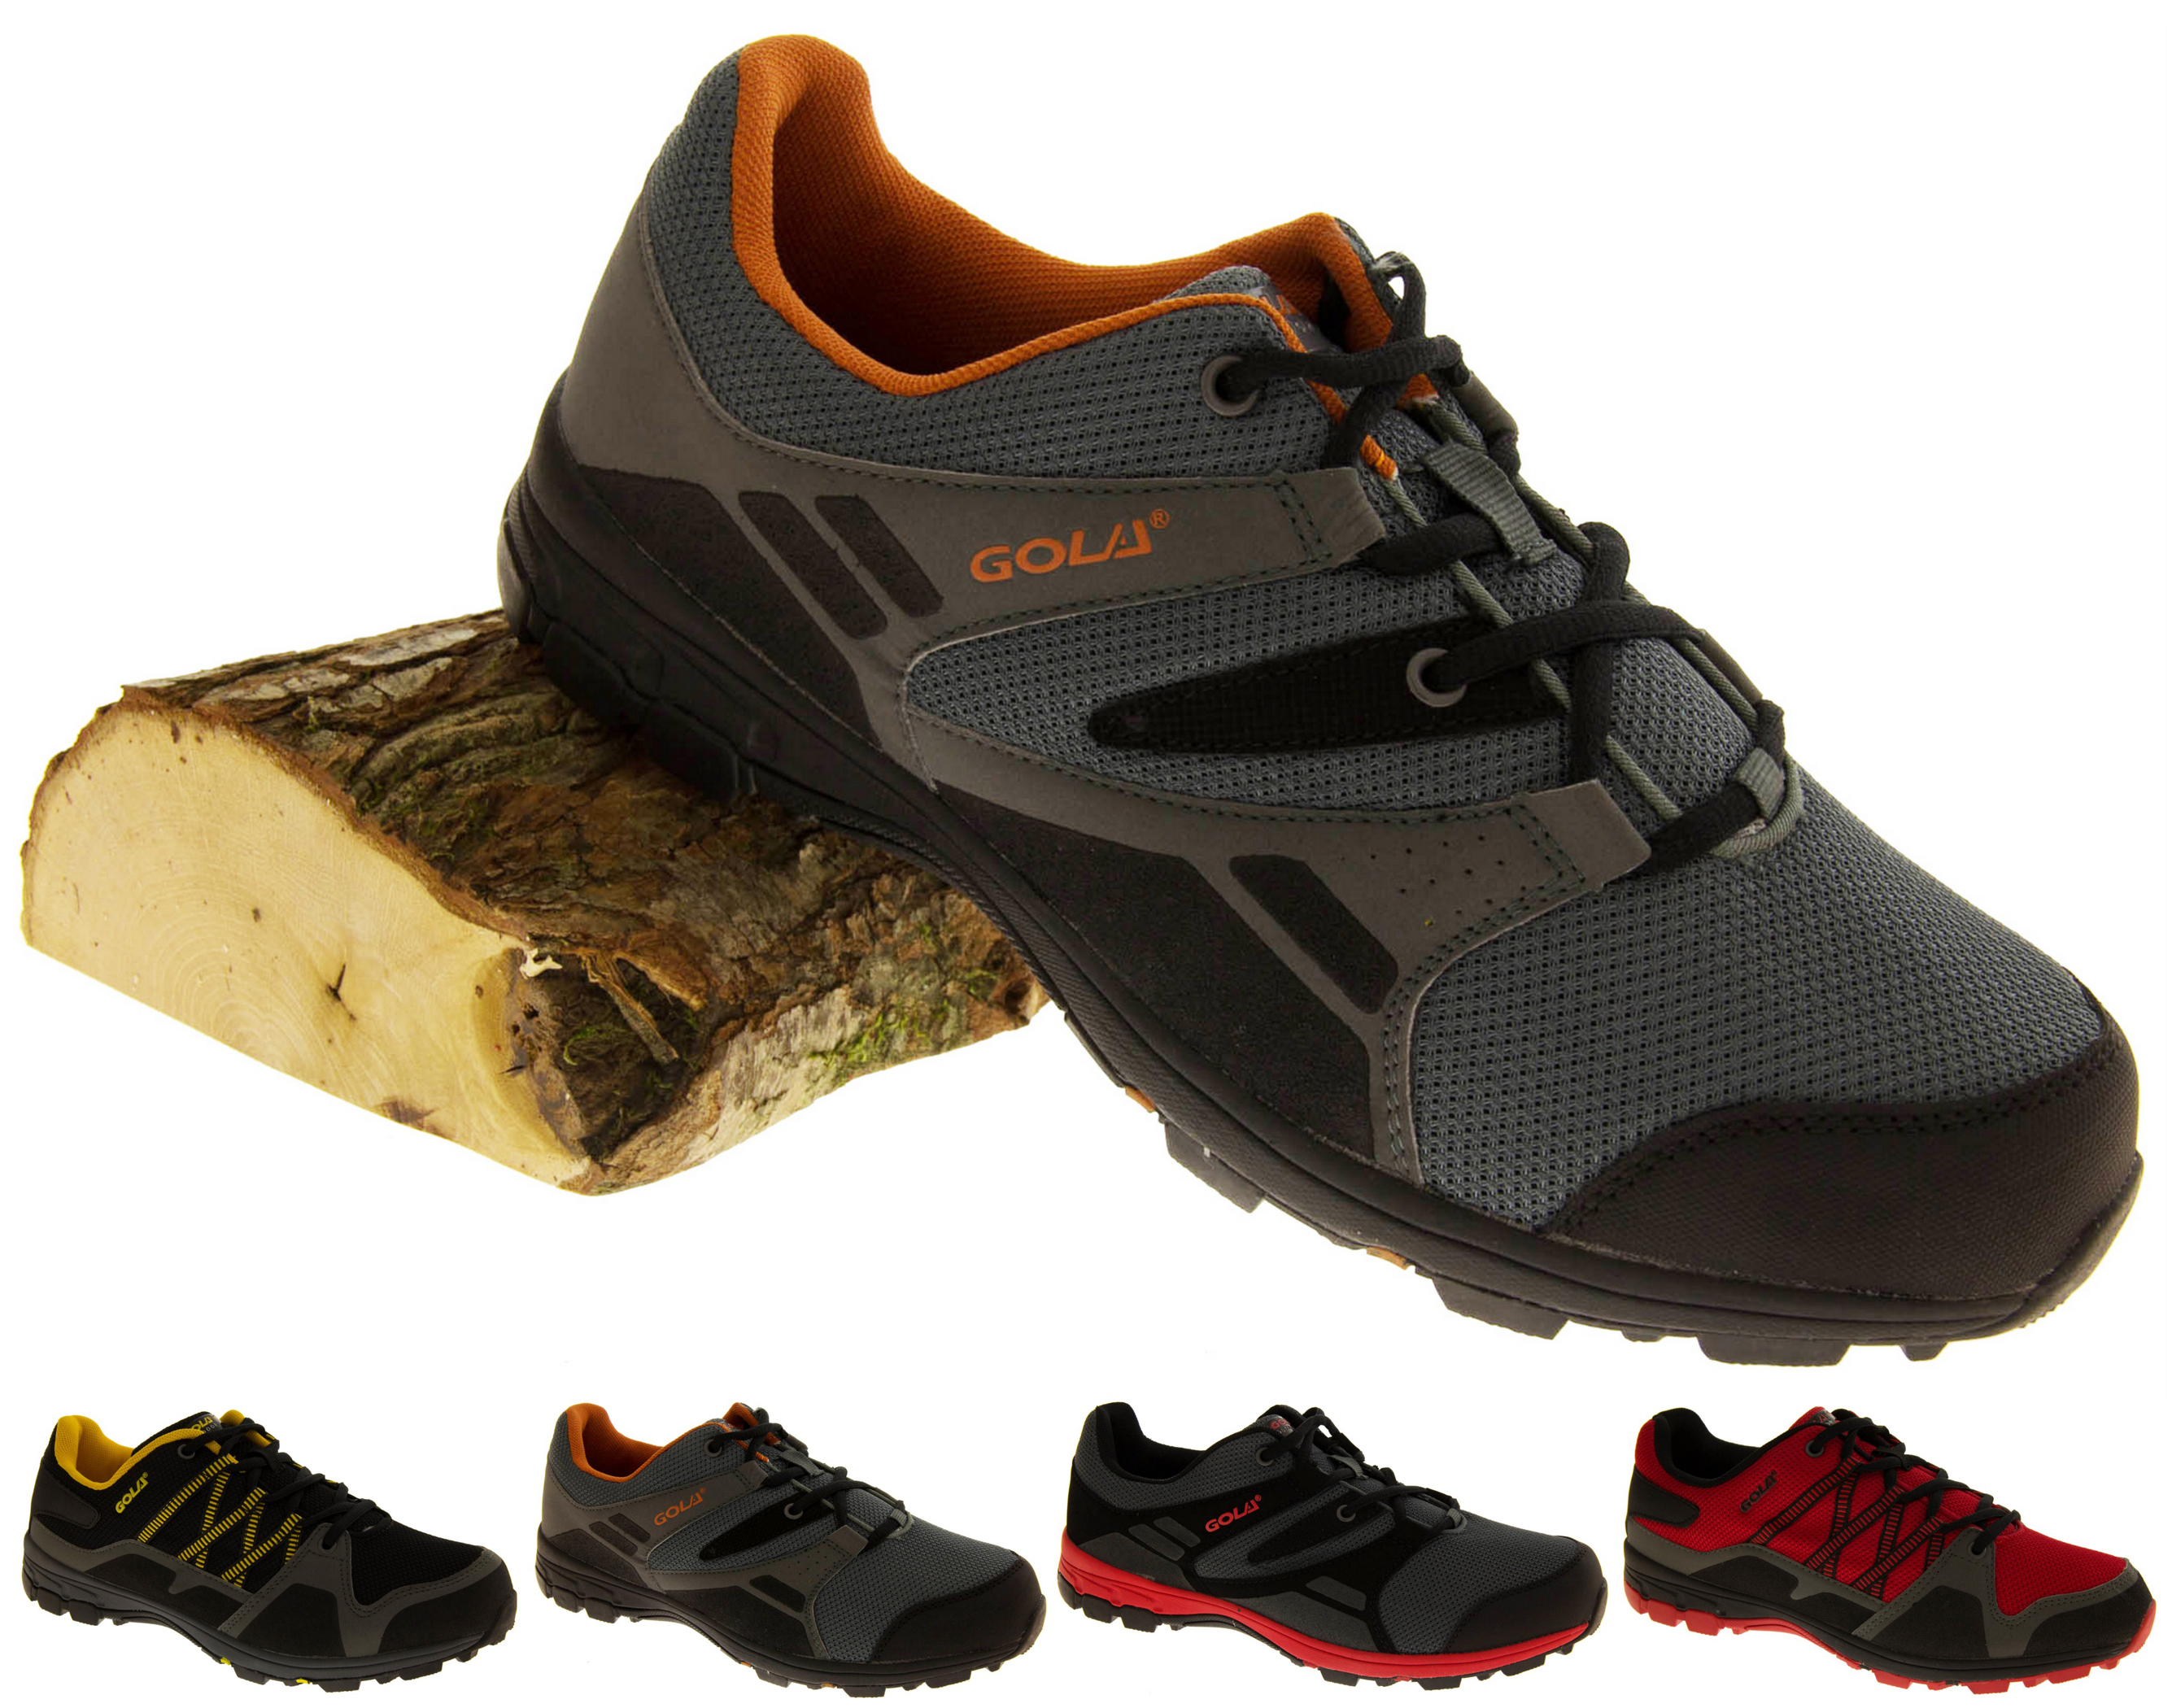 mens gola waterproof outdoor hiking walking work boots